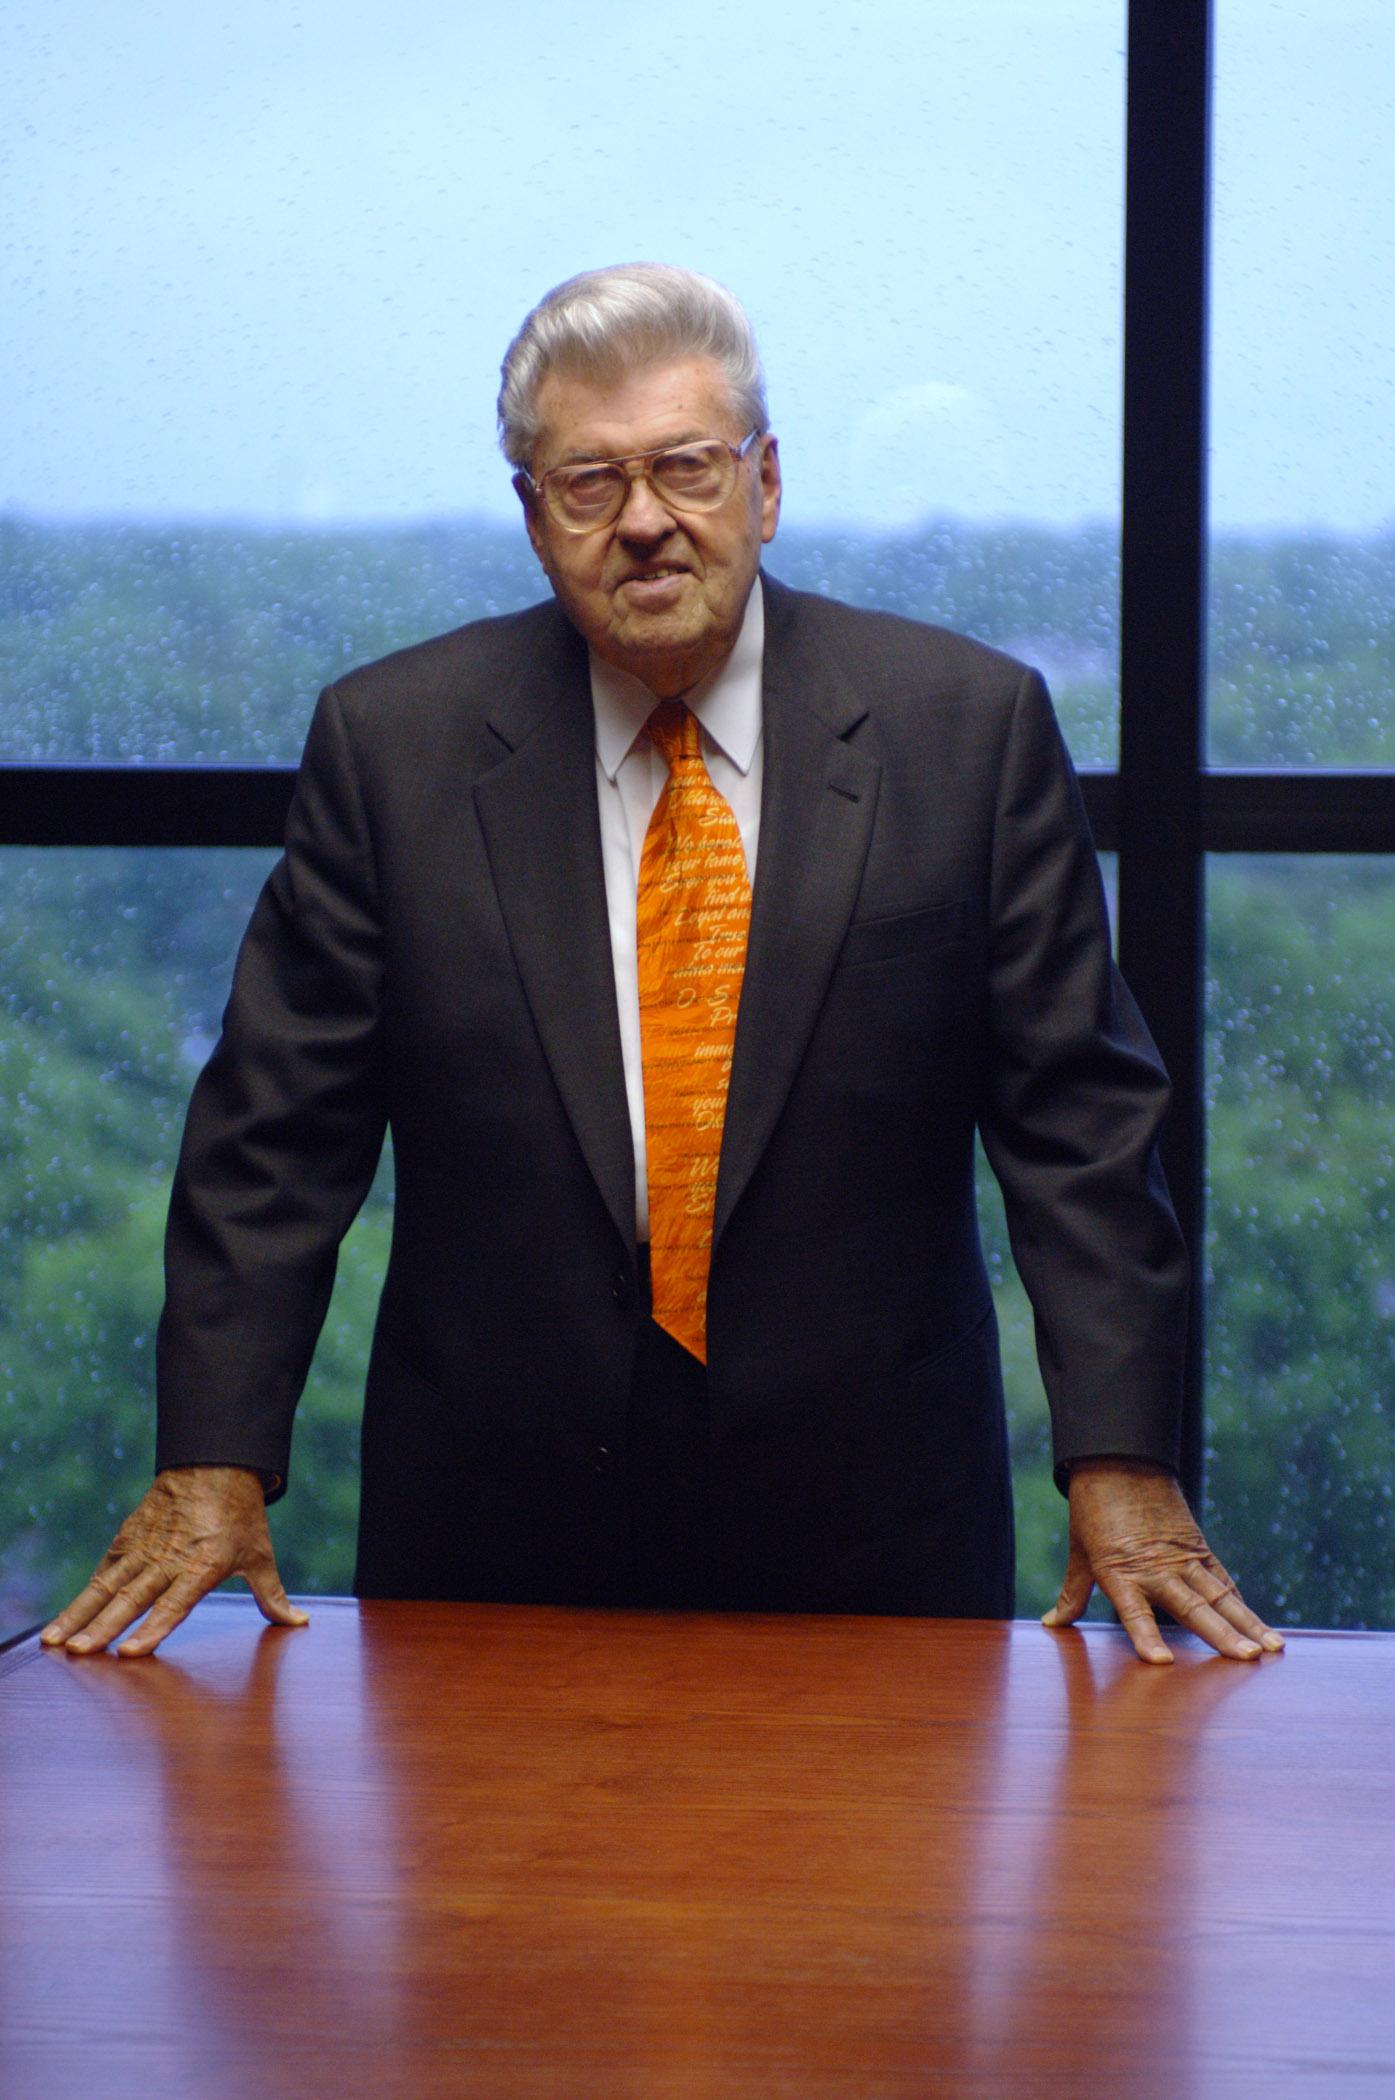 Missouri State University remembers Mr. John Q. Hammons